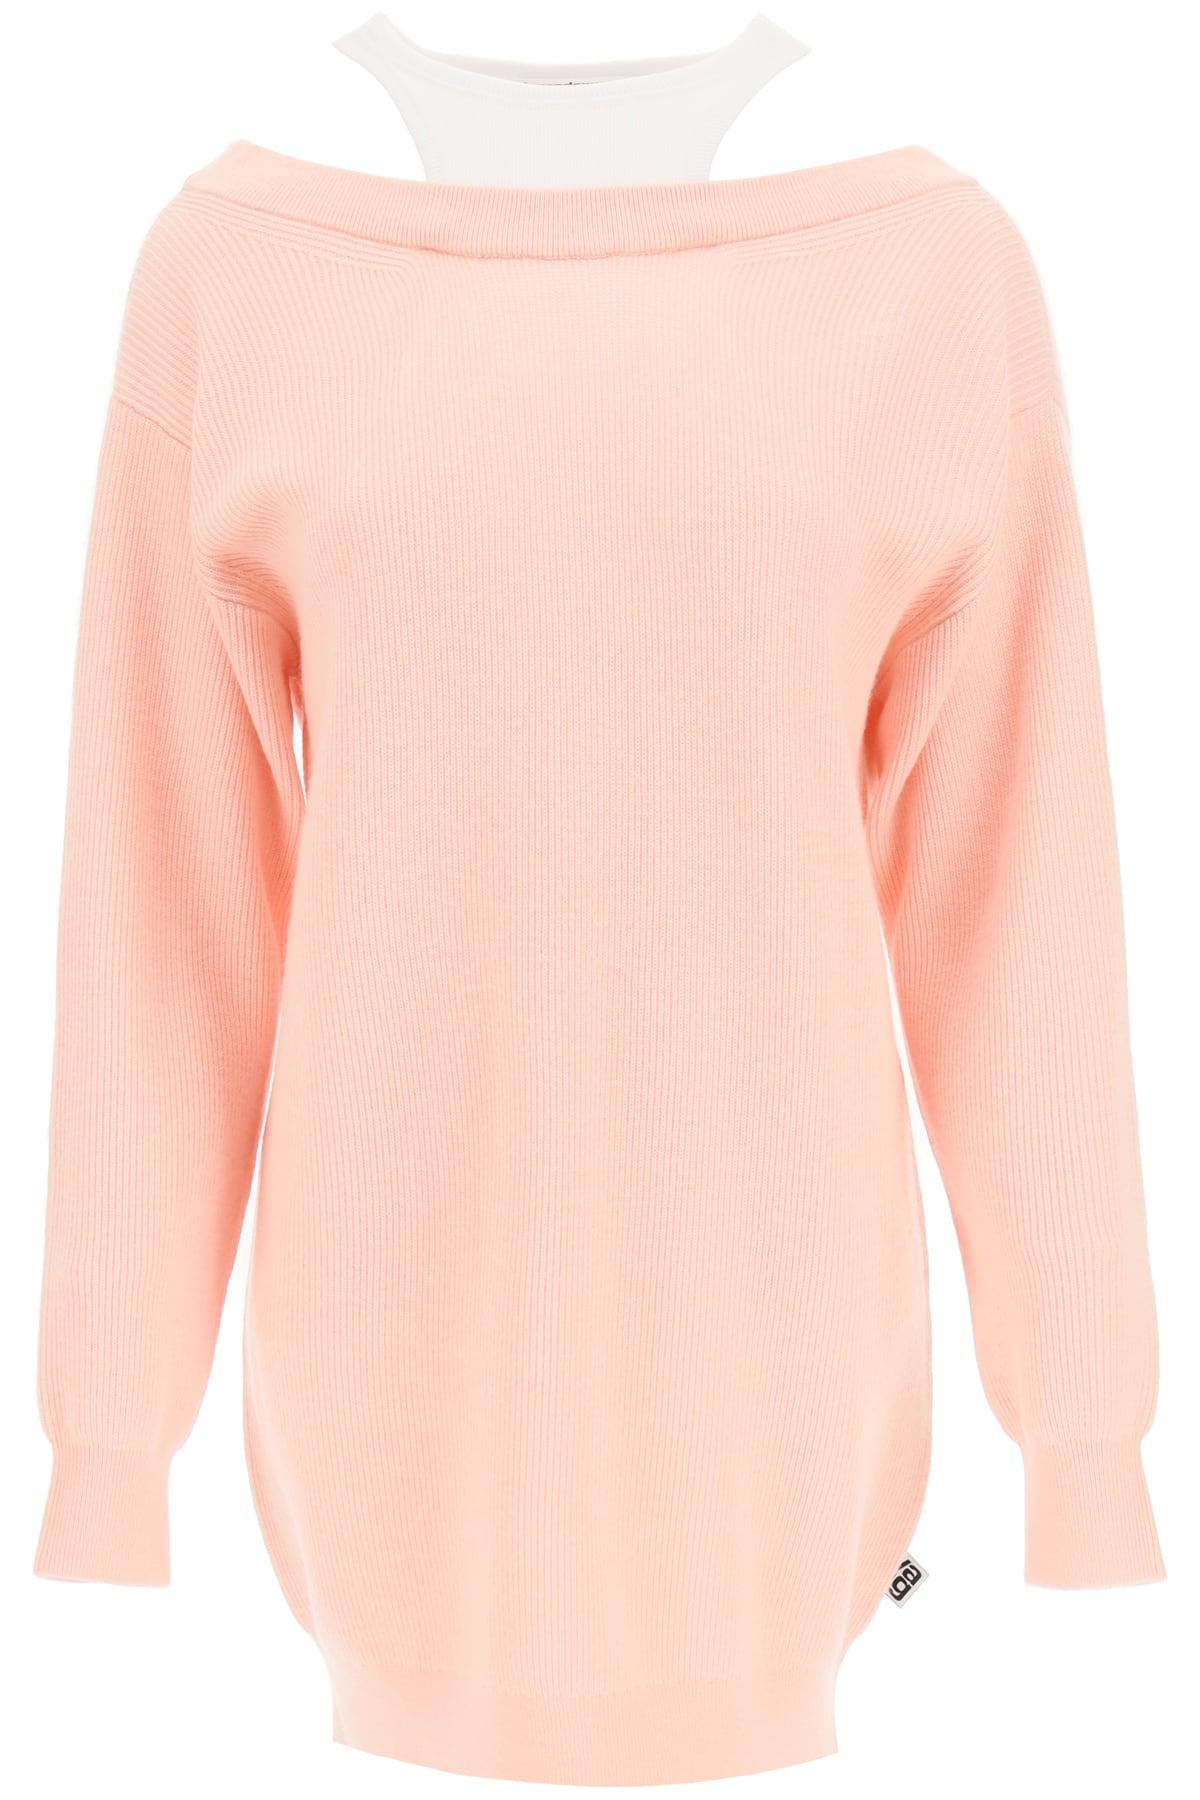 ALEXANDER WANG OFF-SHOULDER WOOL DRESS XS Pink, White Wool, Cotton